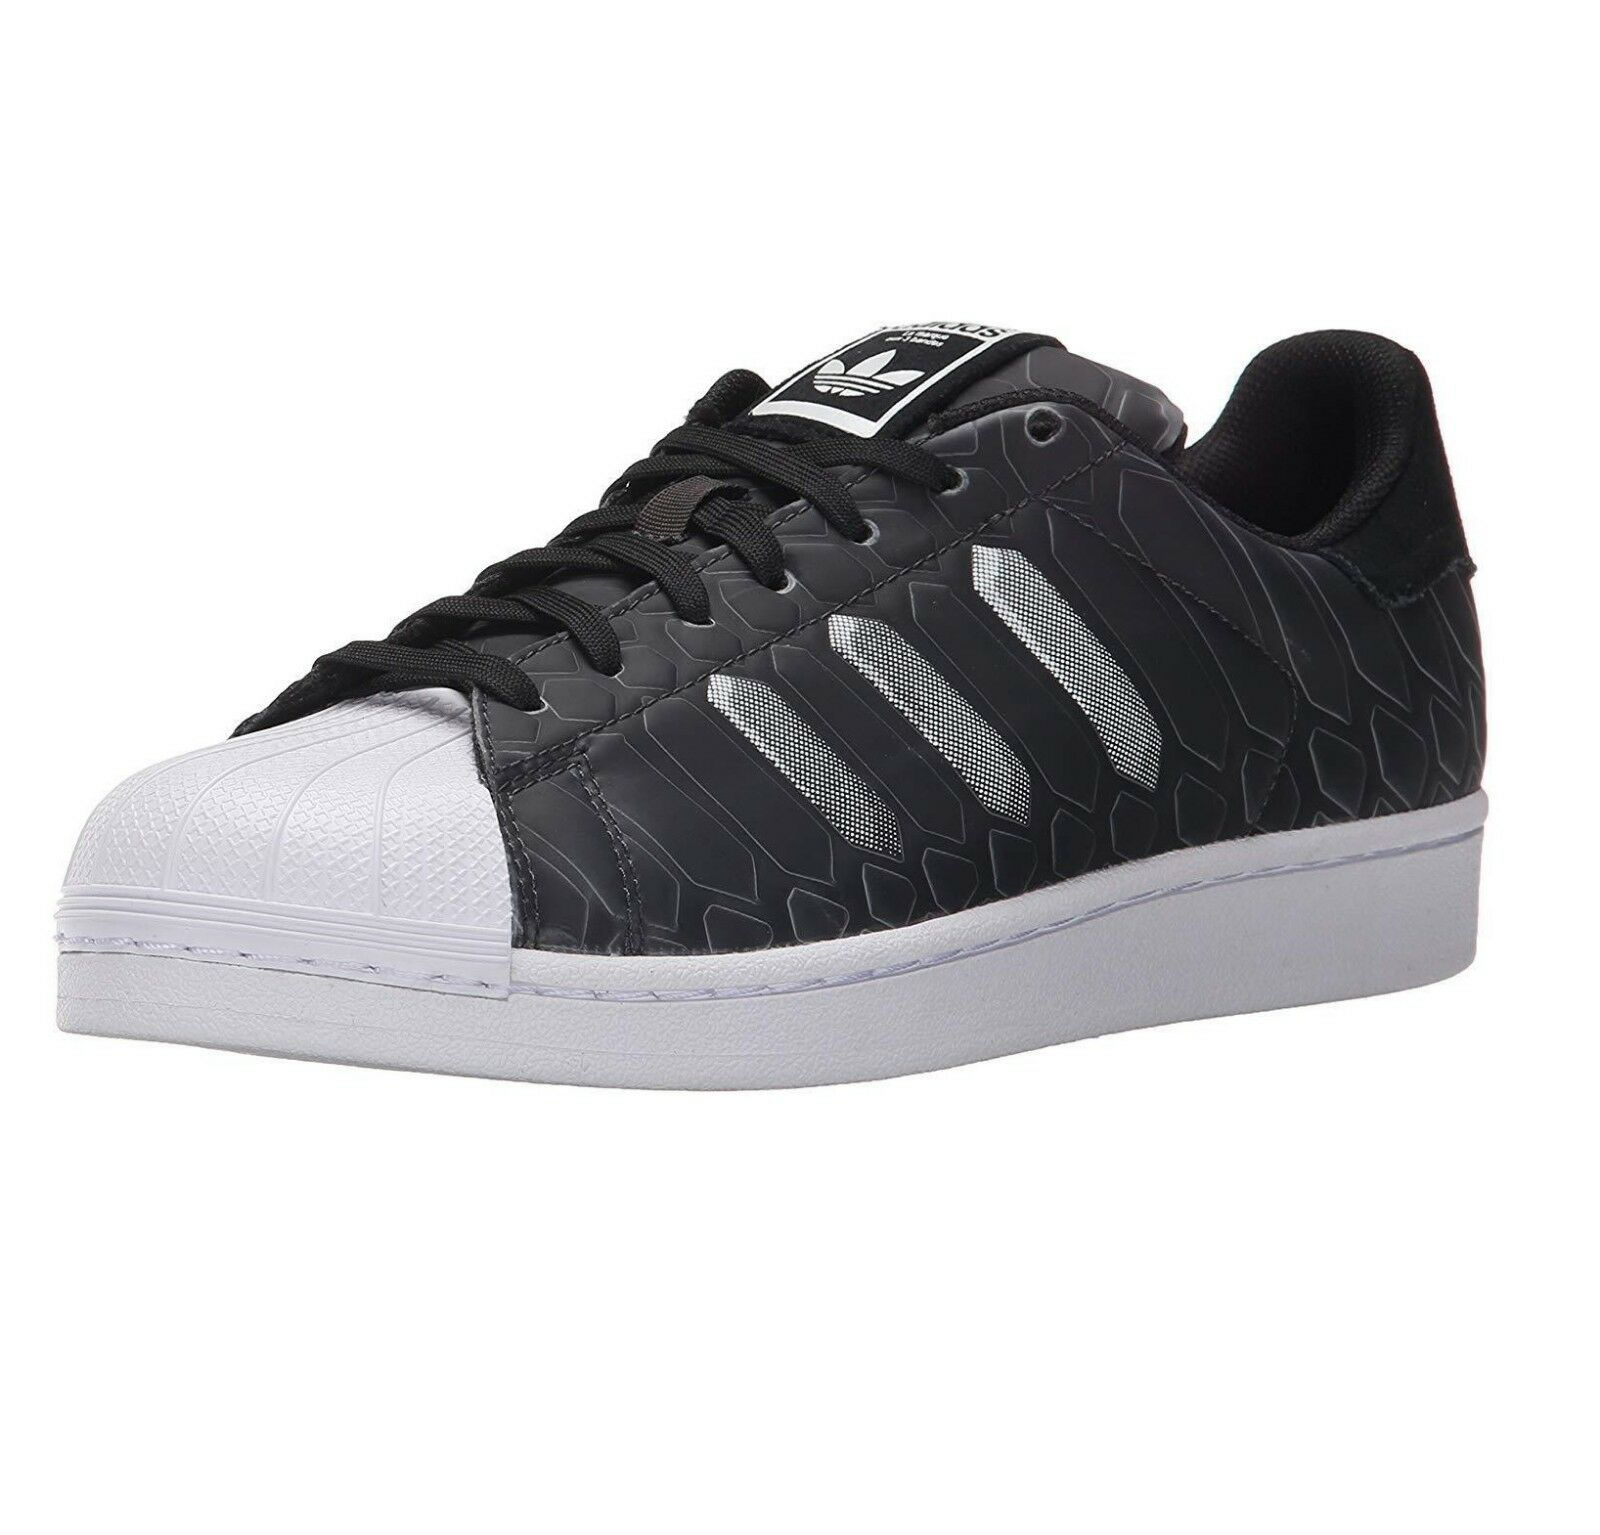 Adidas Originals Superstar CTXM Chromatech Black White AQ7841 Mens Size 11.5